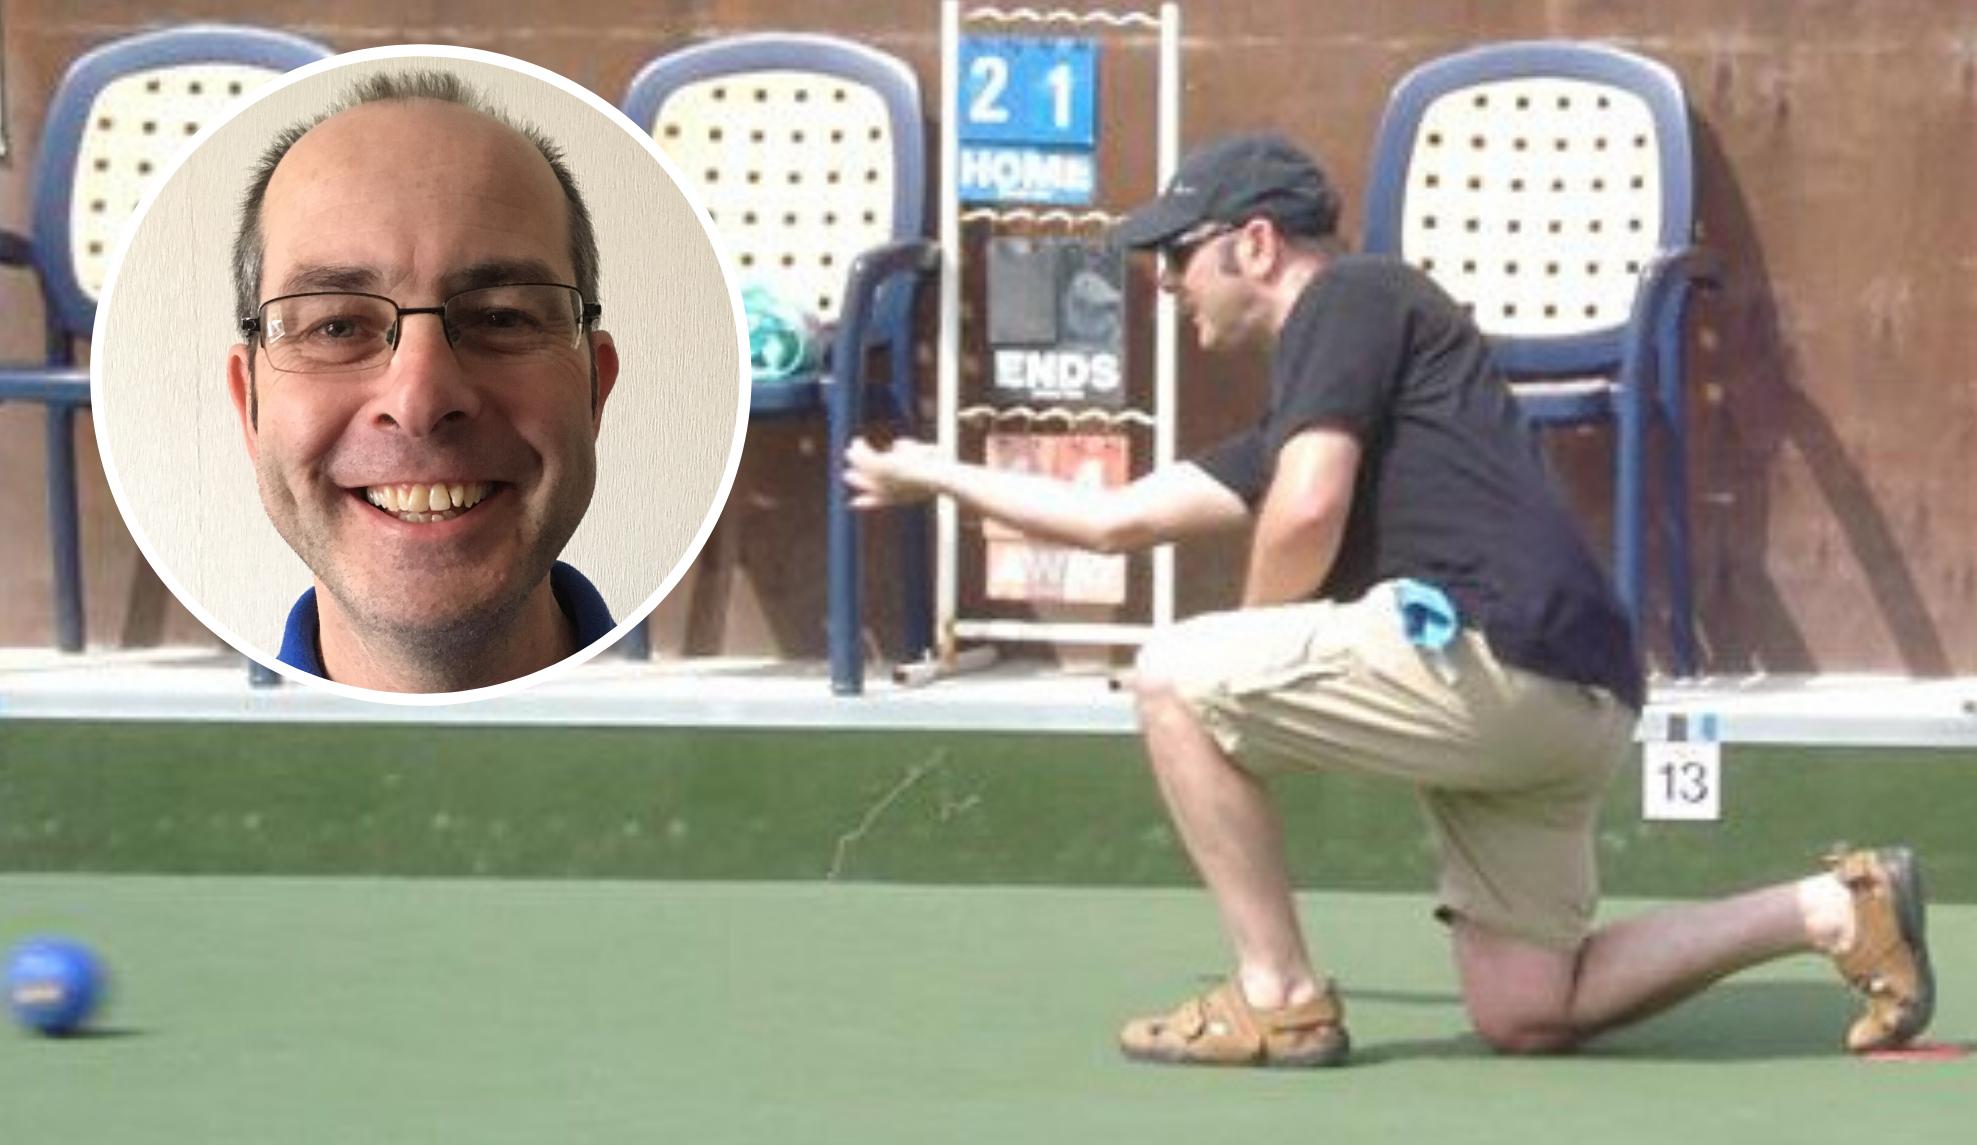 Wrexham bowls player recounts speedy comeback following open heart surgery